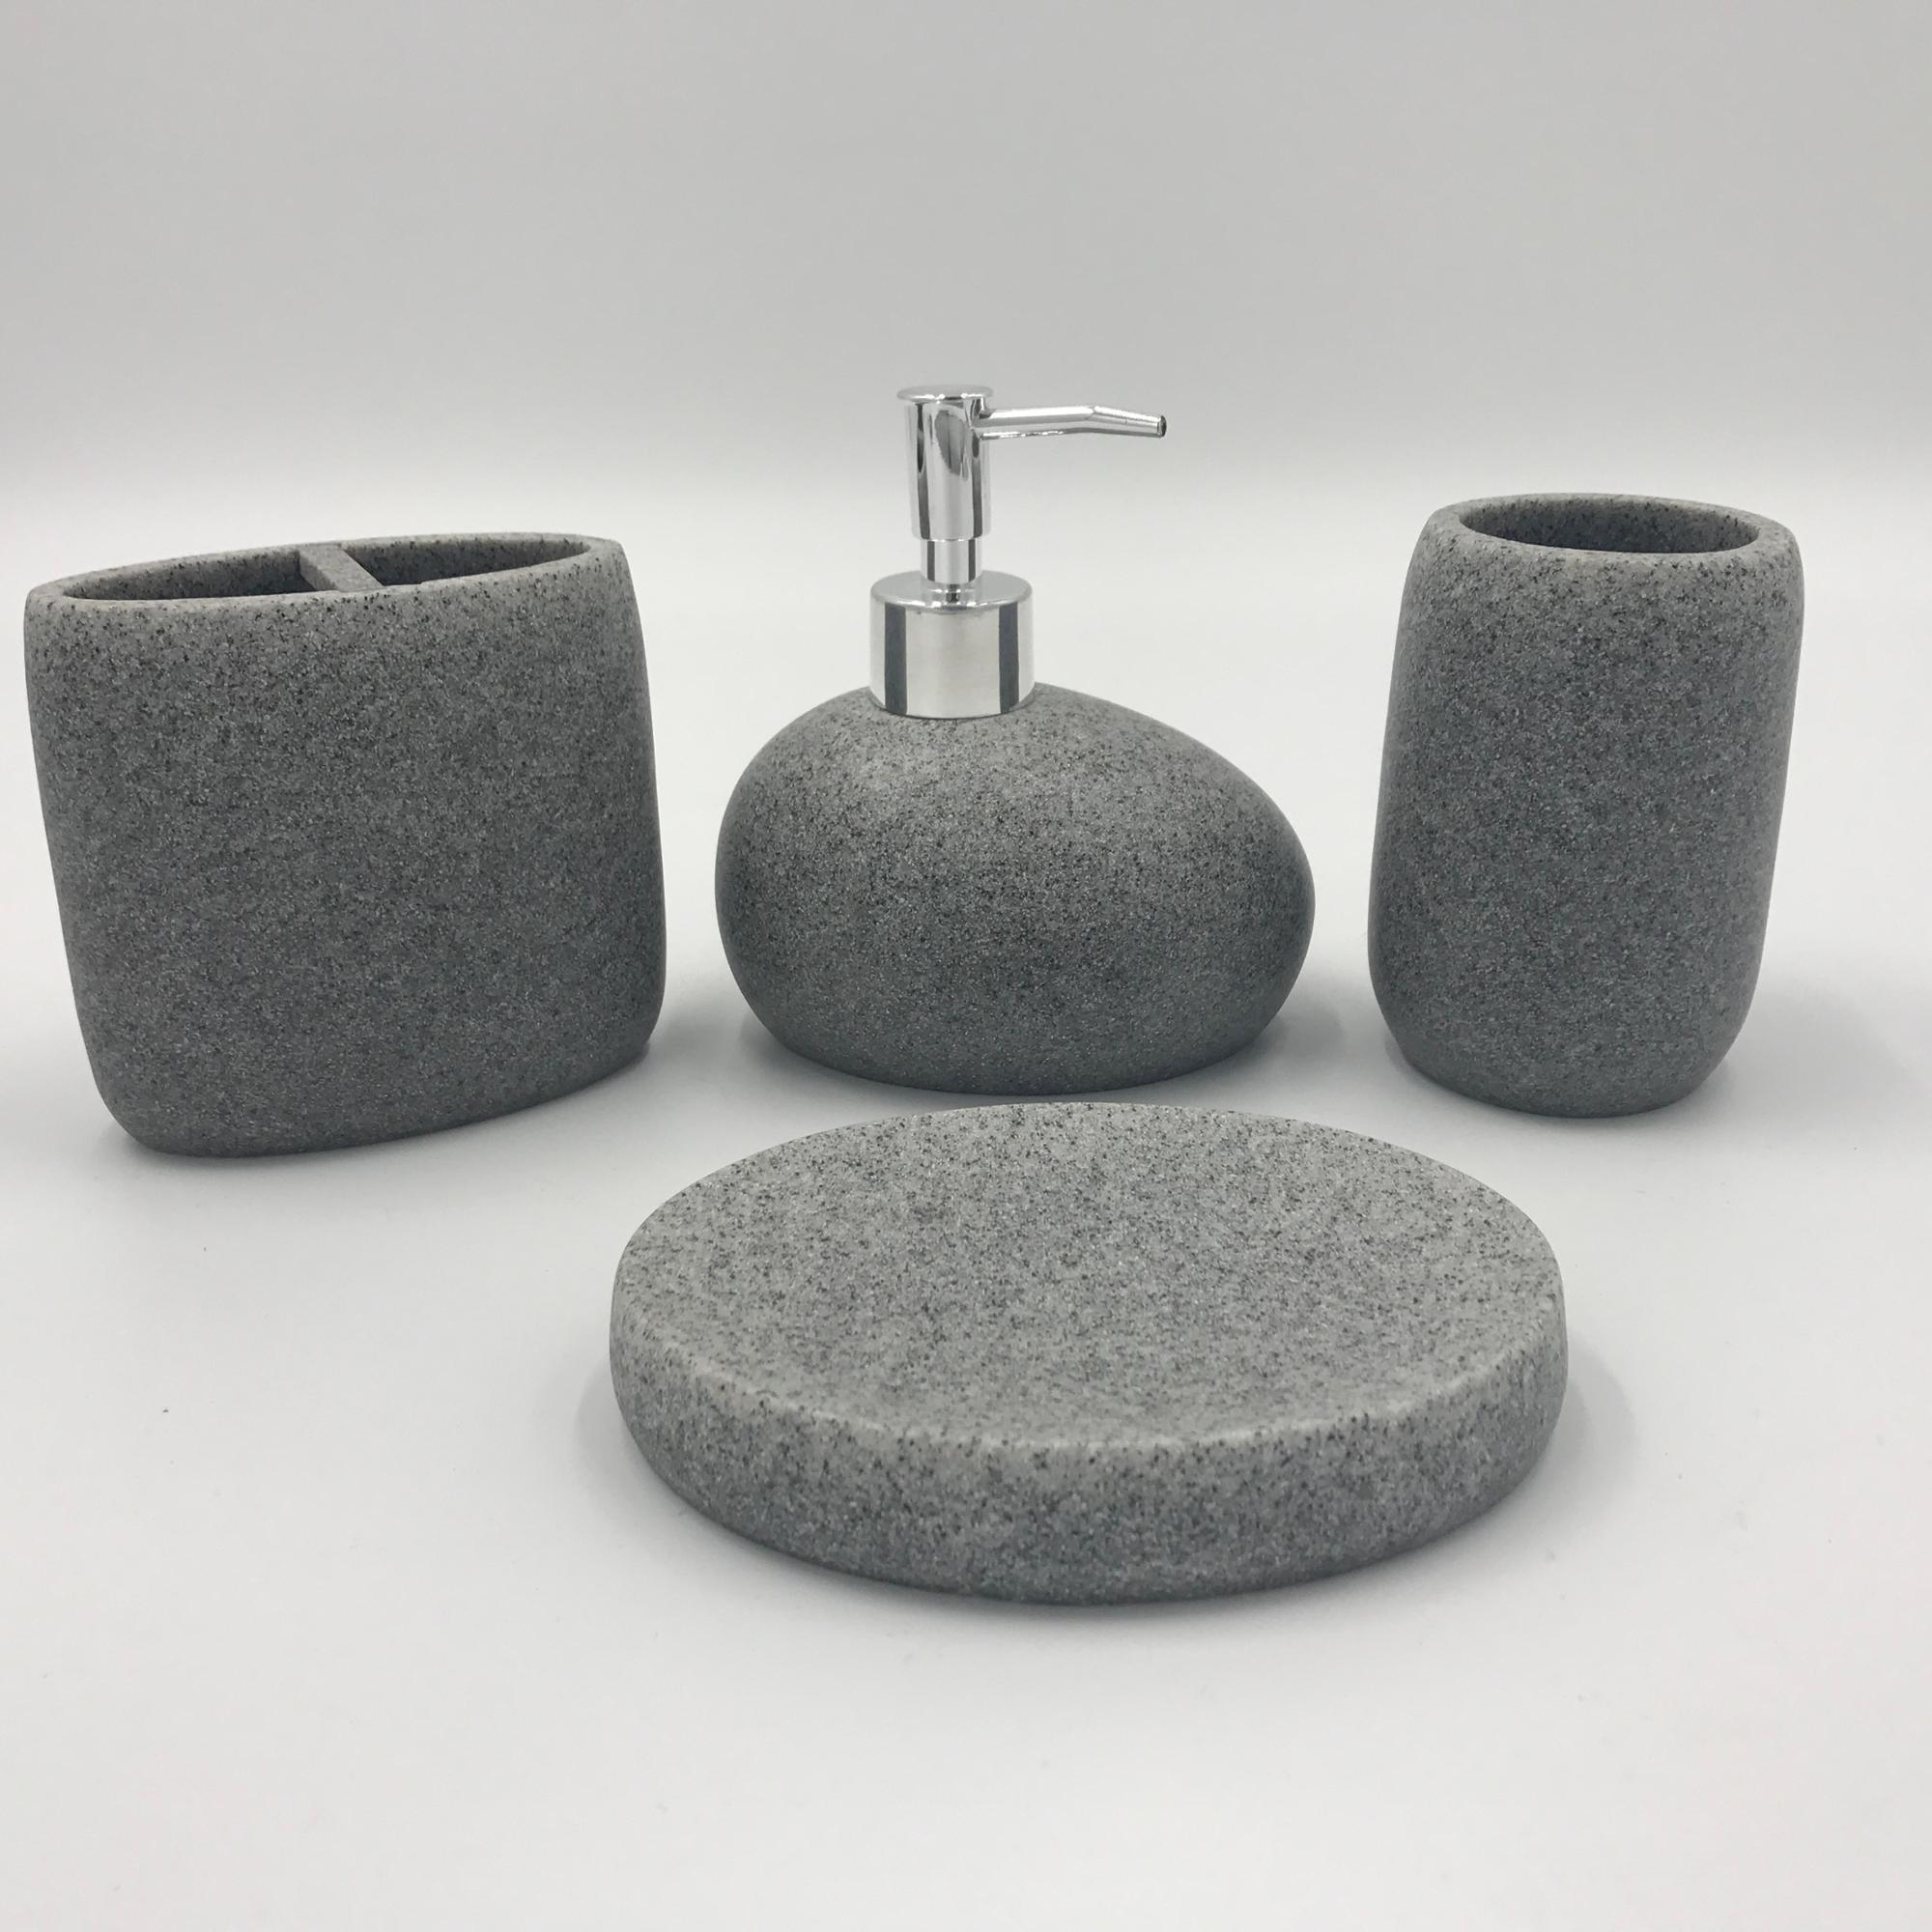 Yellow Sand Stone Resin Bath Accessory Bathroom Accessories Set